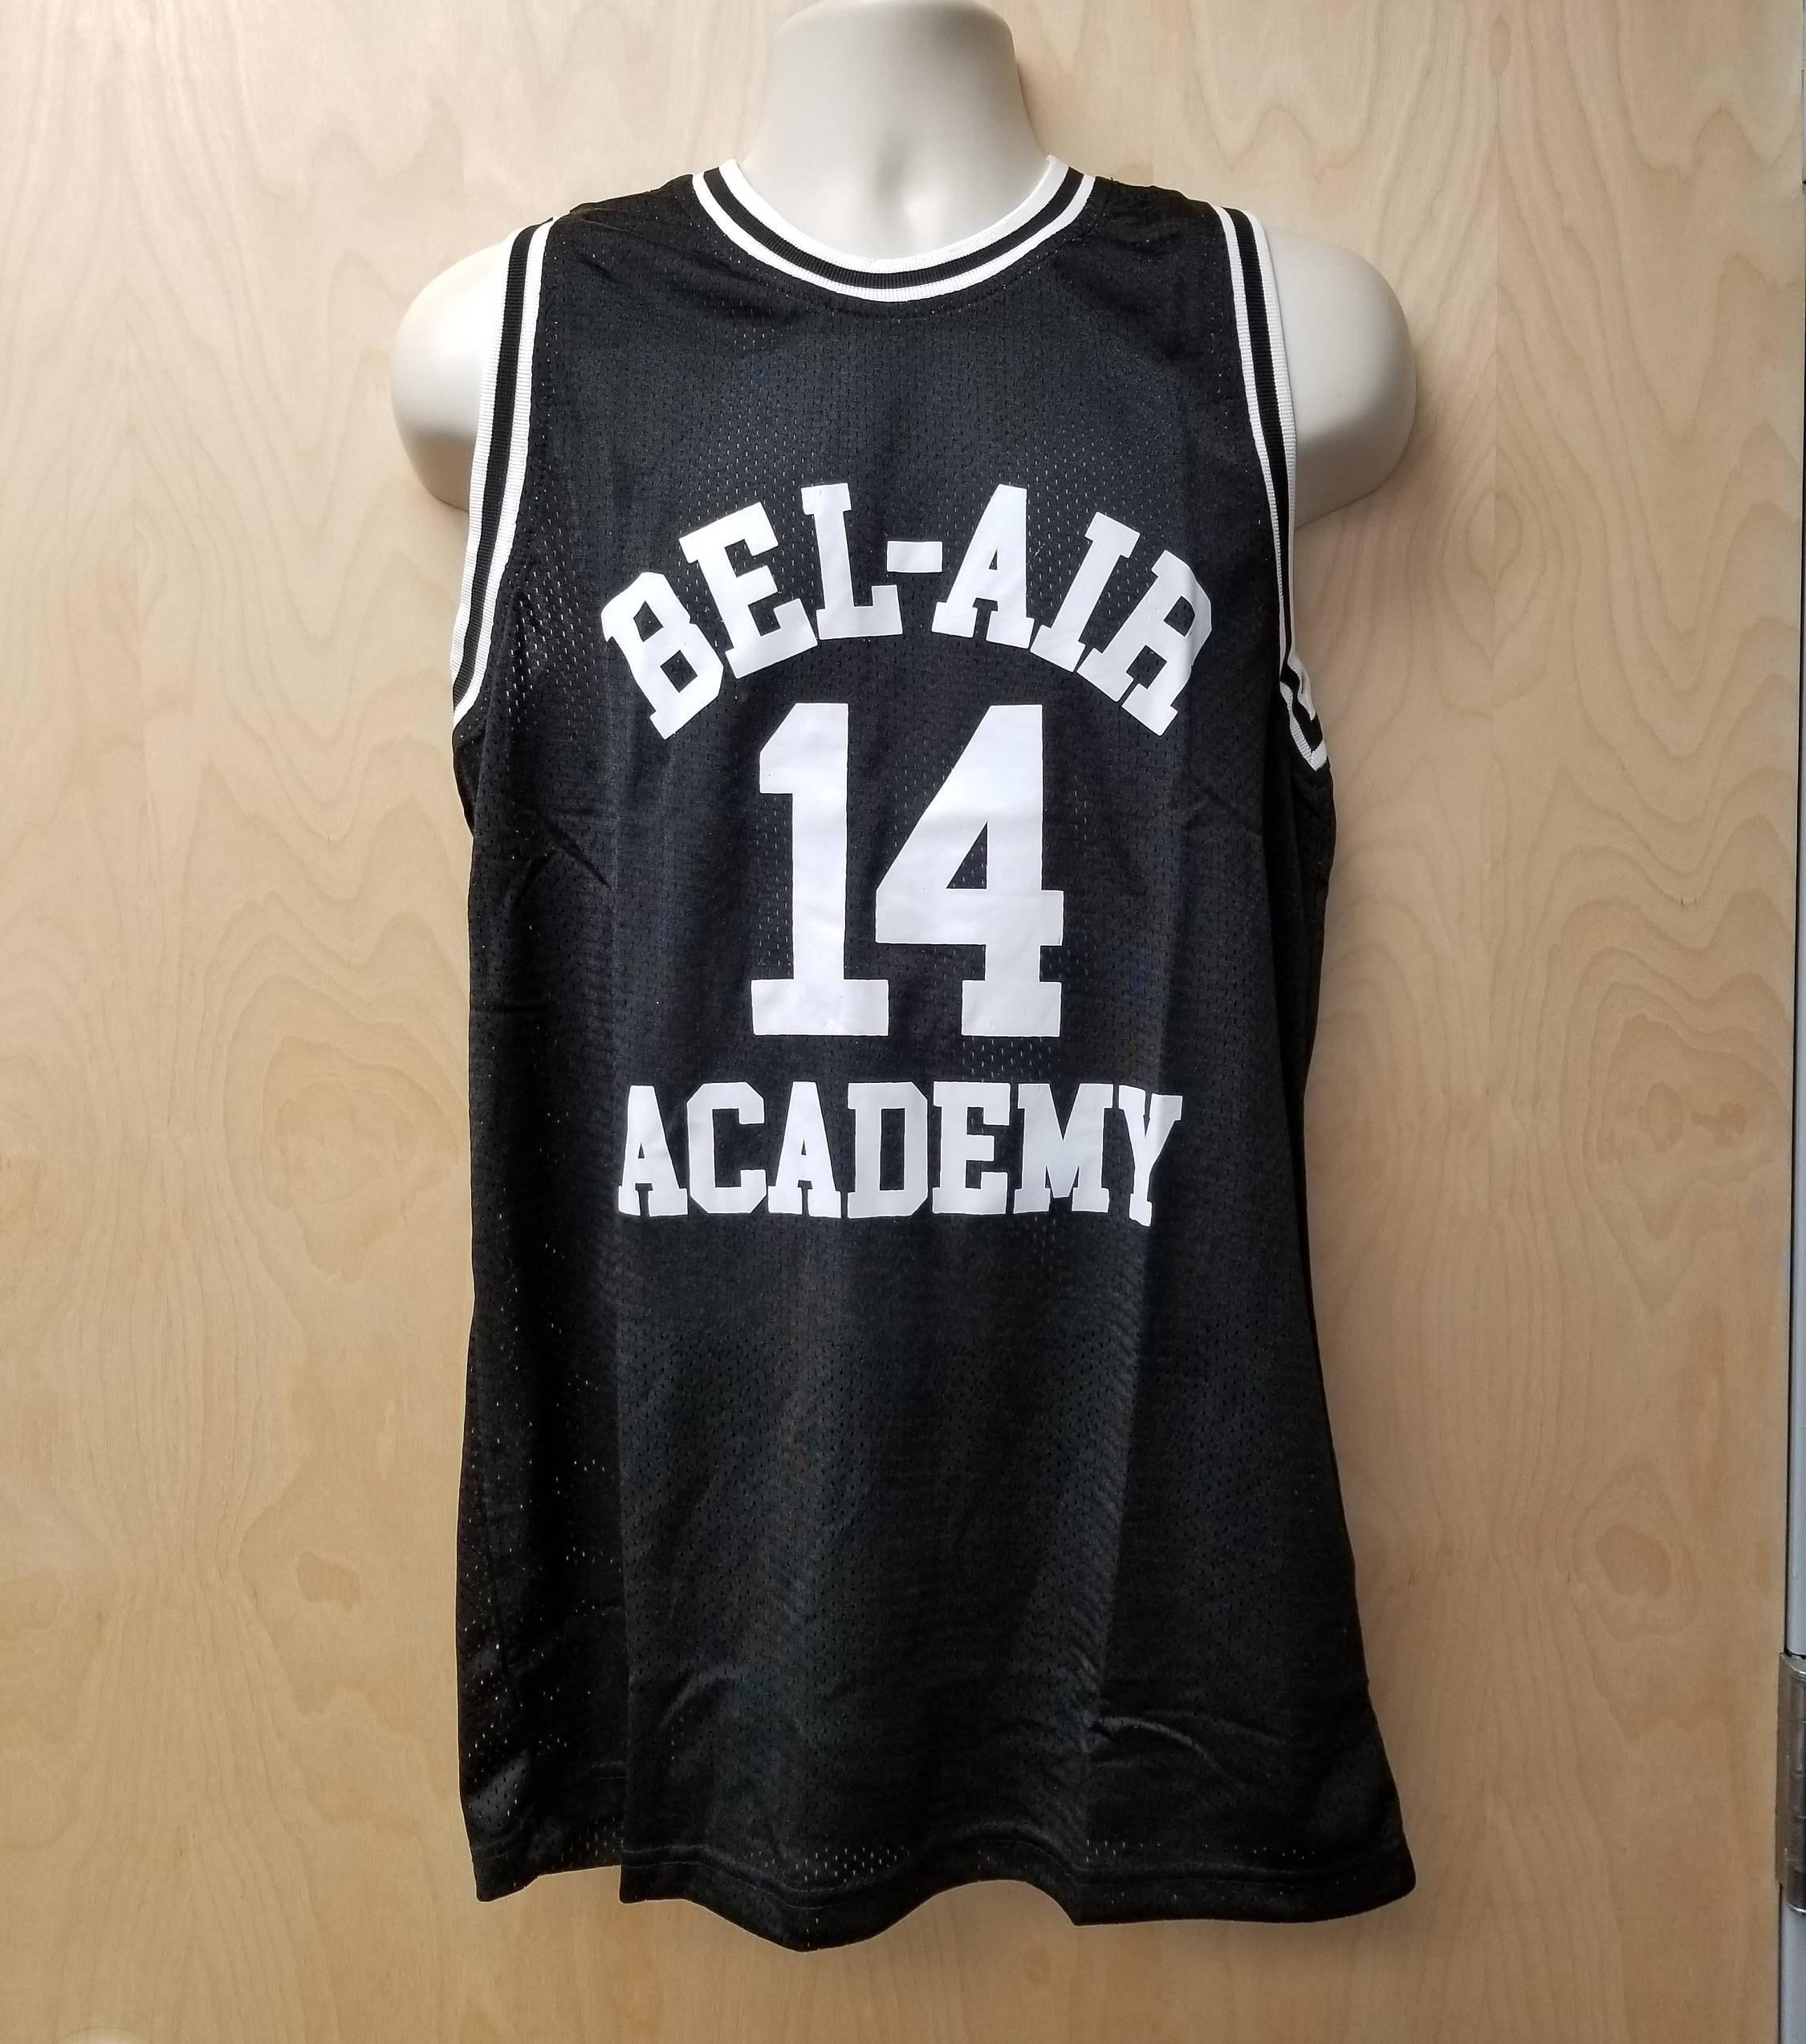 3906927ff08 Bel-Air Academy Will Smith Jersey Basketball Uniform TV Show